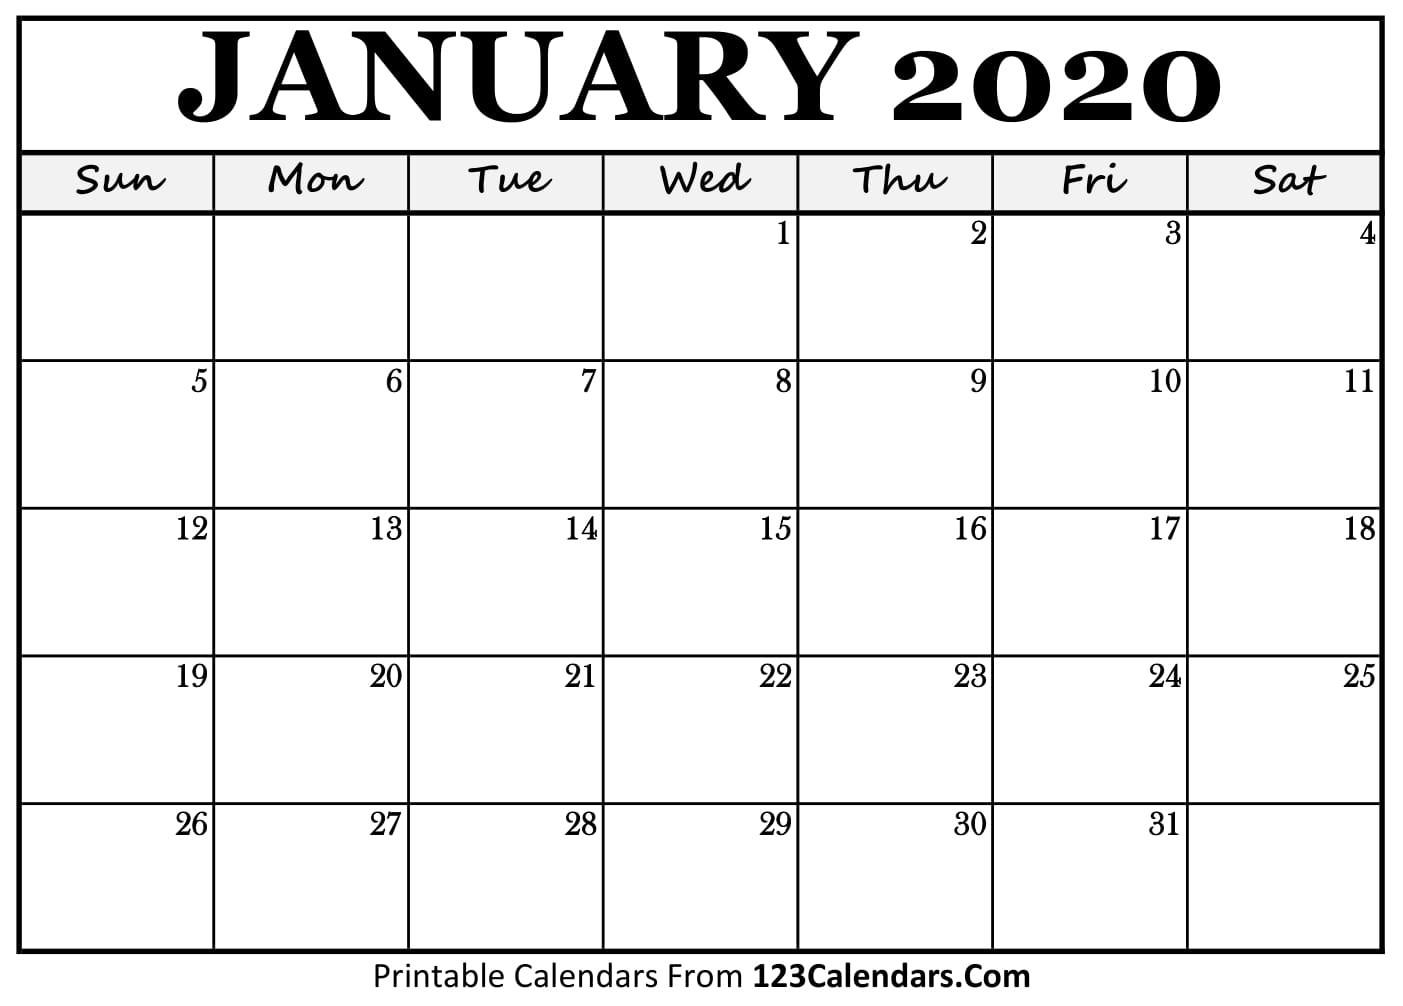 Free Printable Calendar   123Calendars-Printable Calendar 2020 Monthly June July